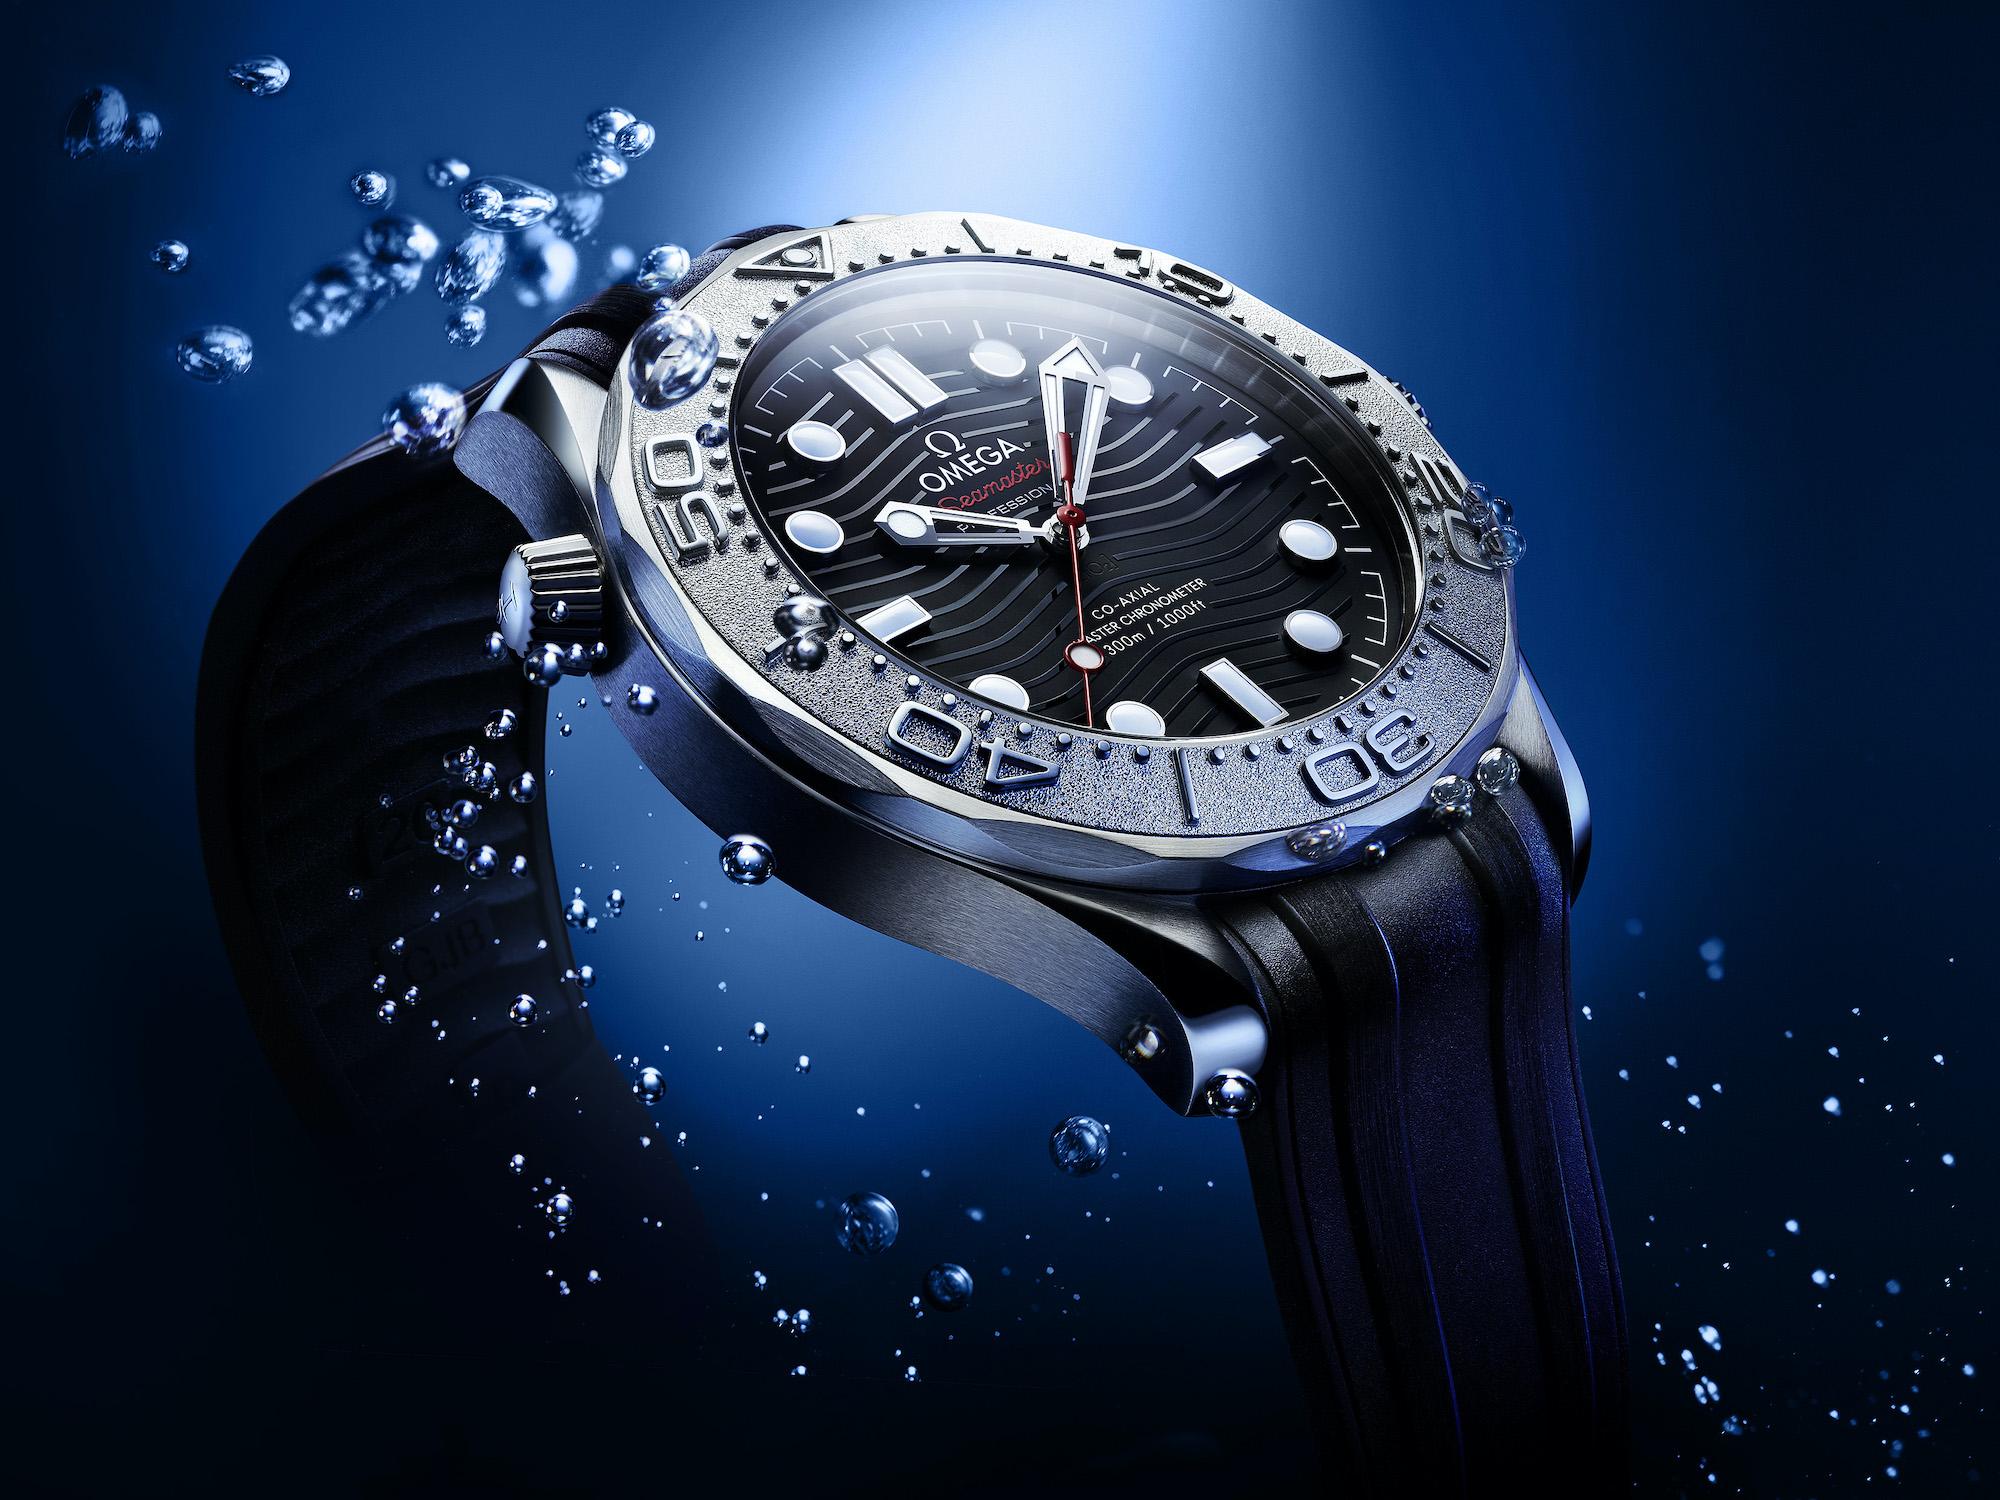 Omega Seamaster Diver 300M Nekton Edition 210.32.42.20.01.002 lifestyle